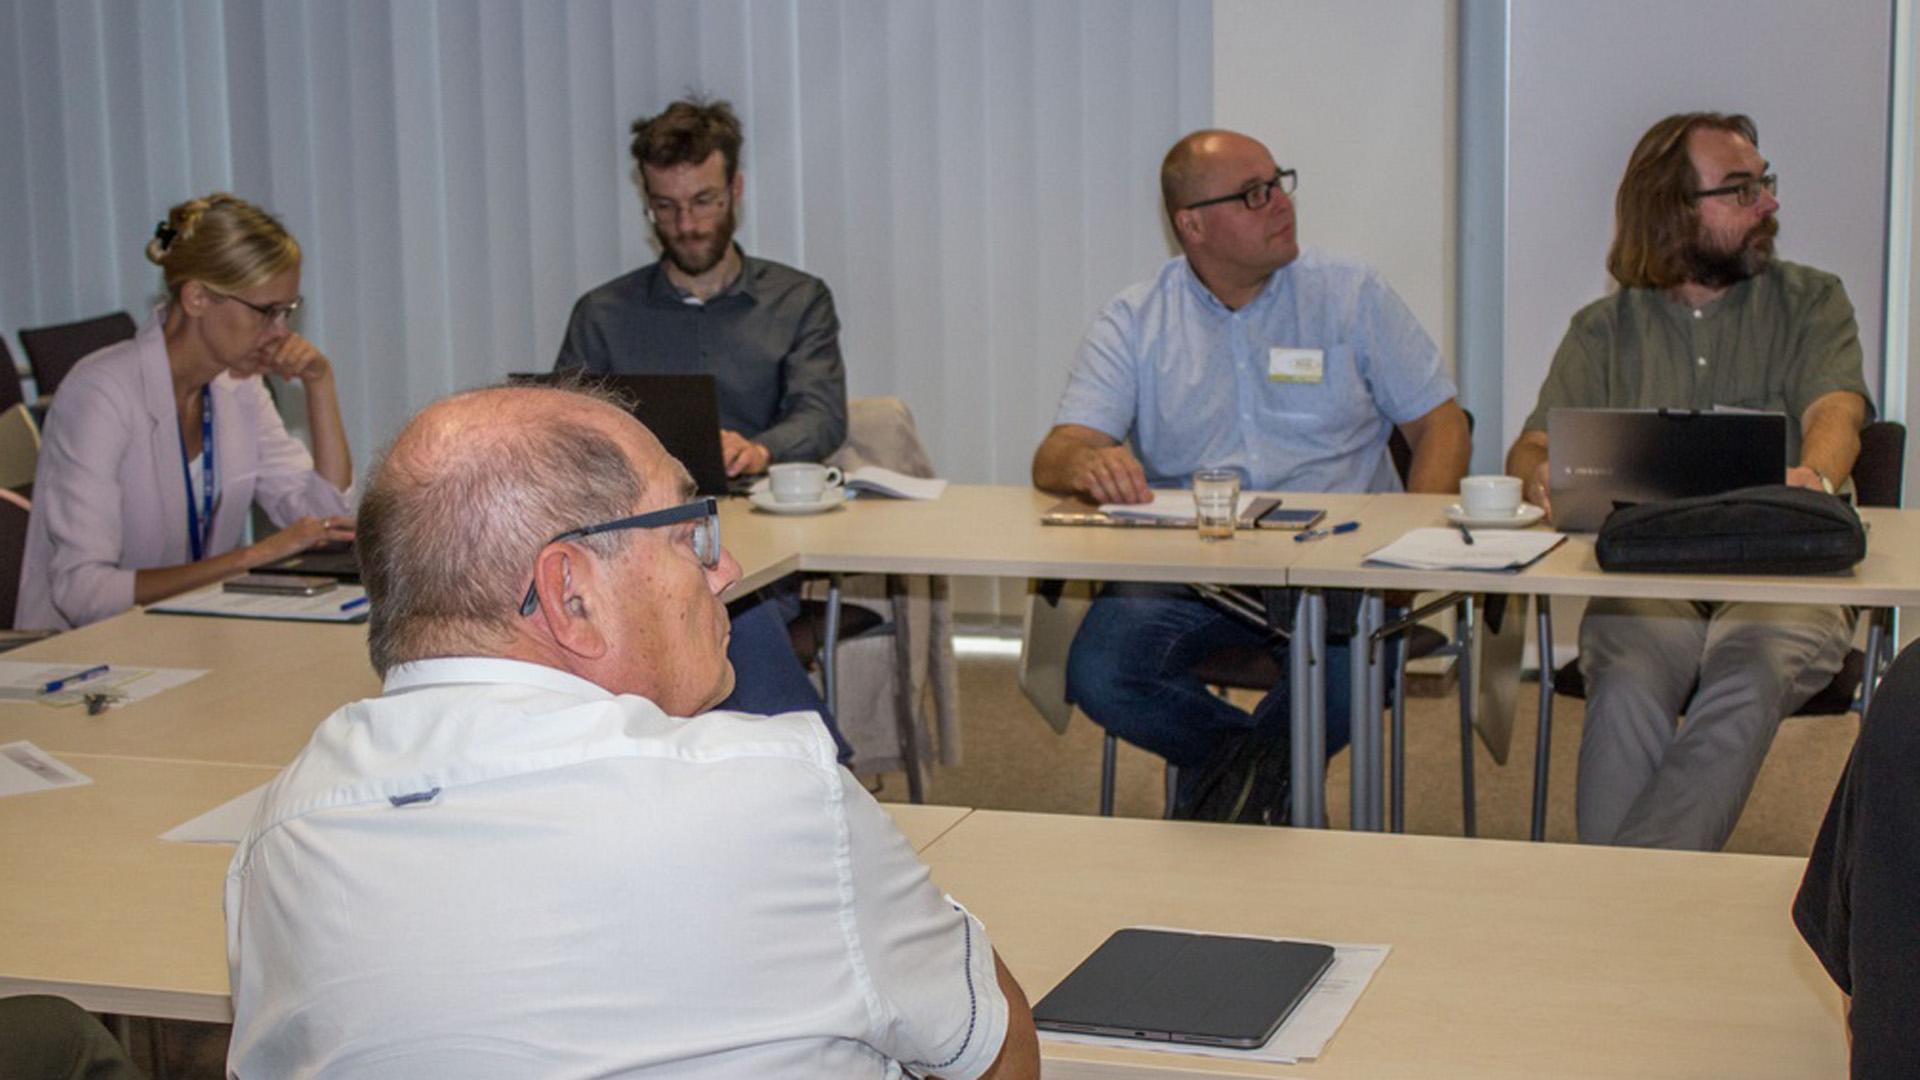 Konferencja_Kolegium_Programowego_02_fhd